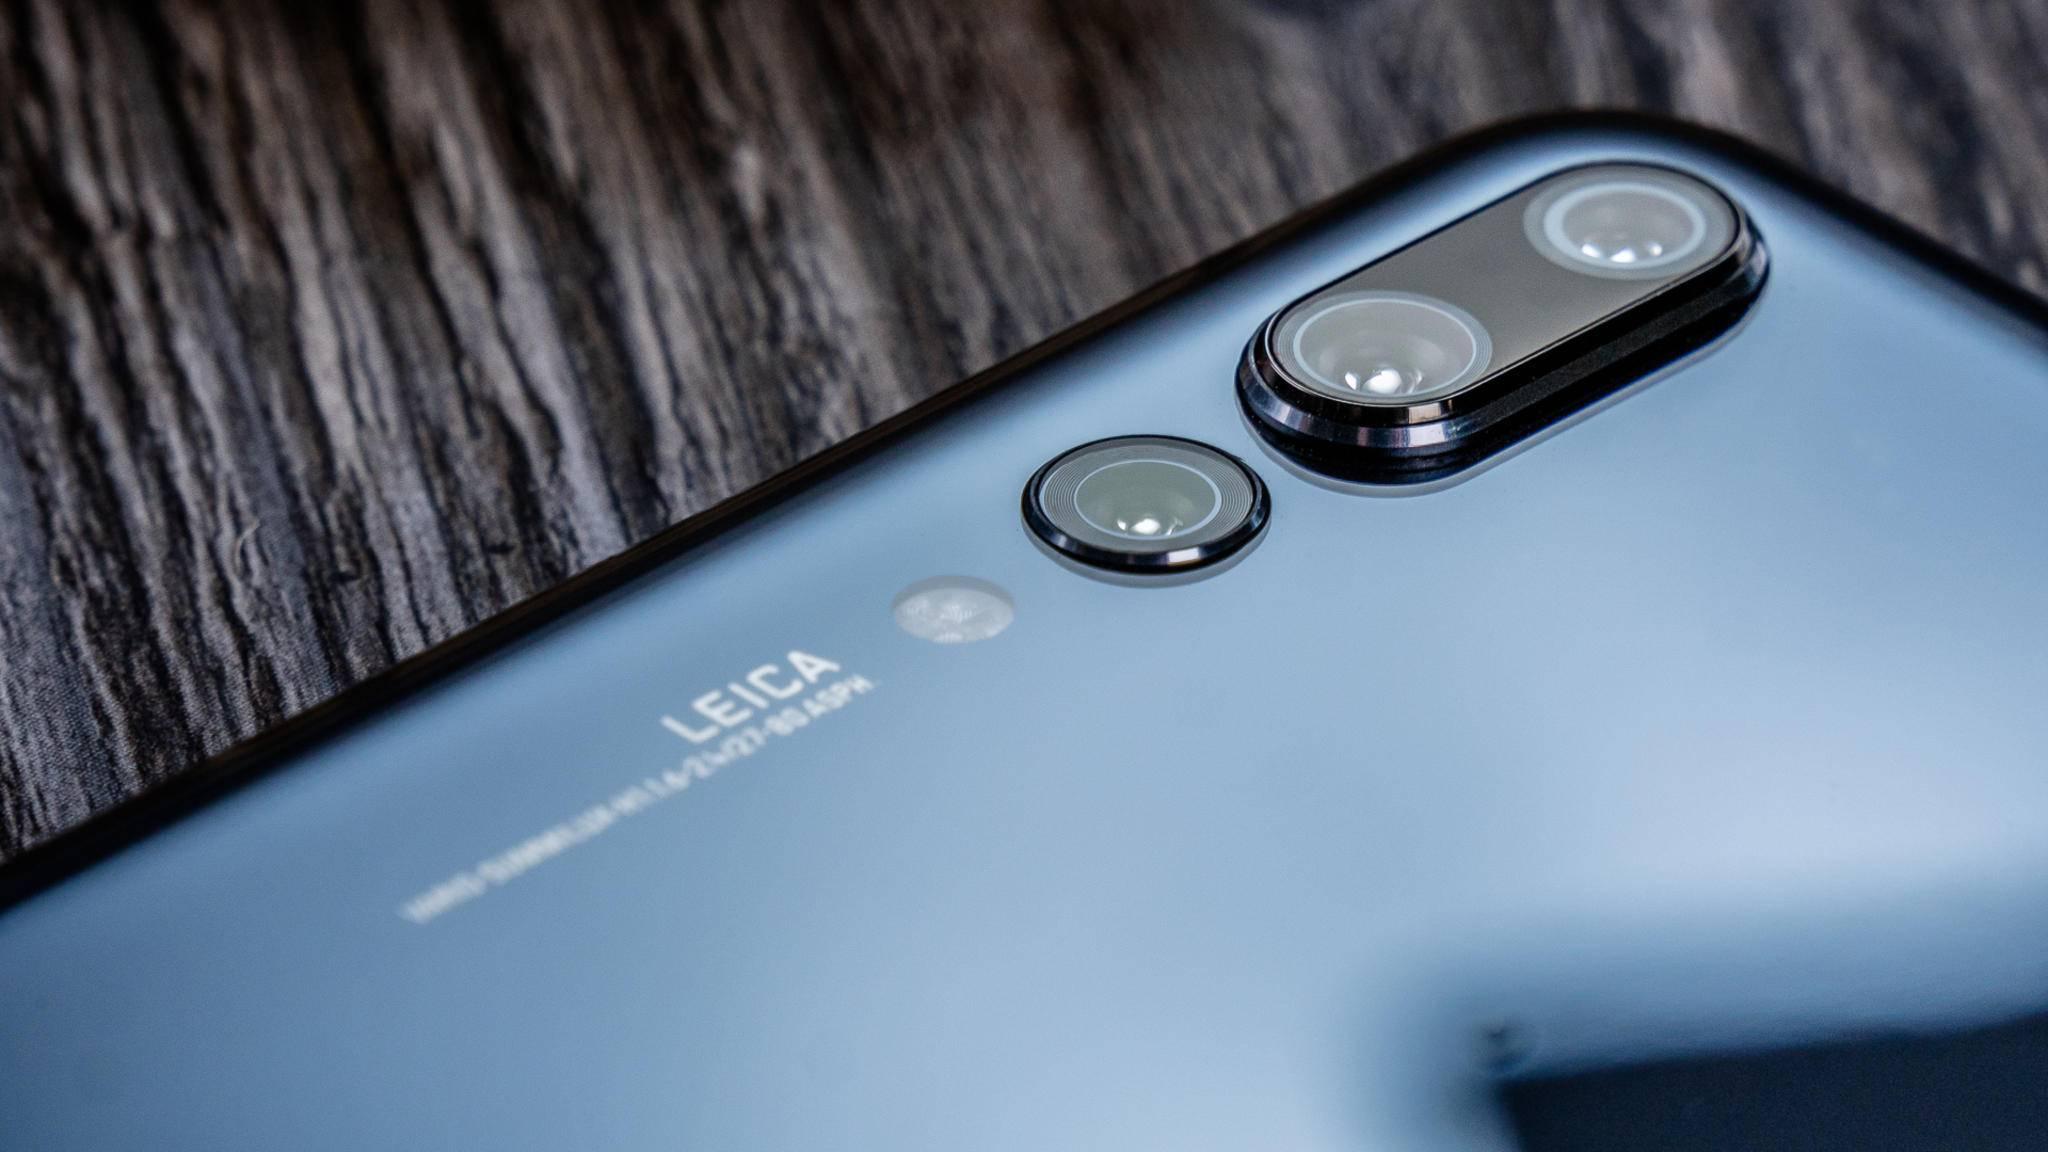 Die Hauptkameras des Huawei P20 Pro knipsen starke Selfies.